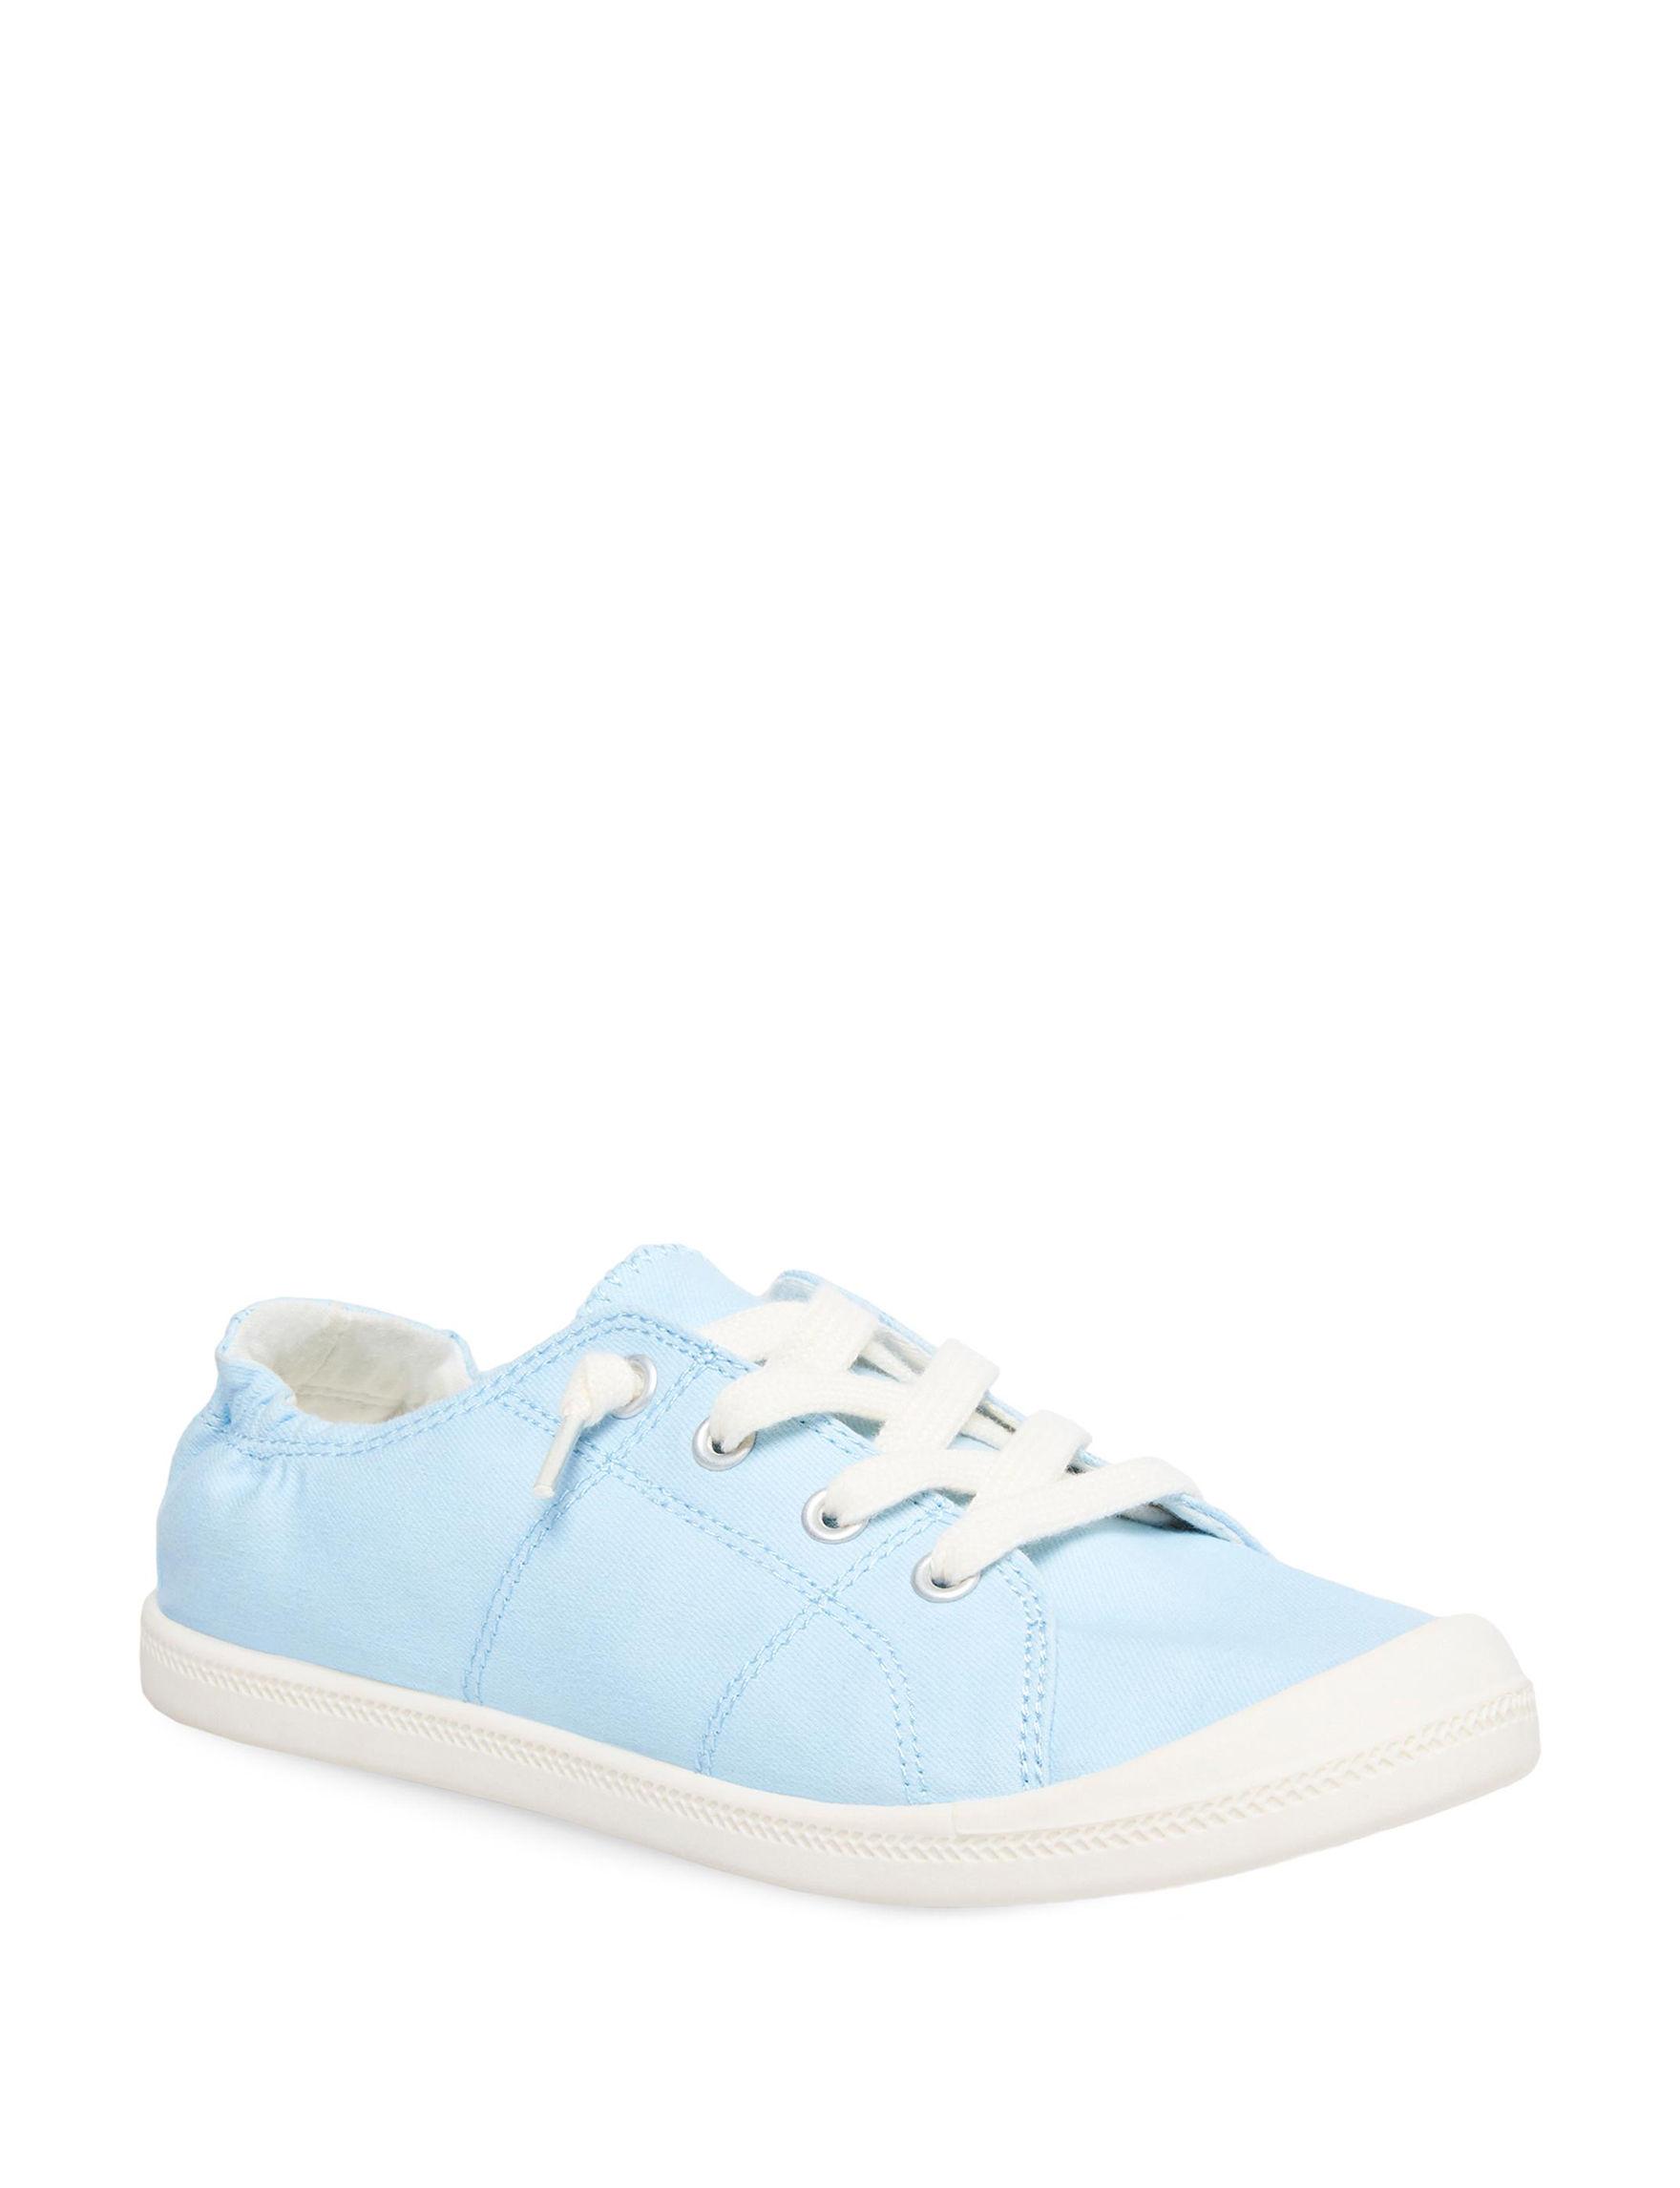 Madden Girl Blue Comfort Shoes